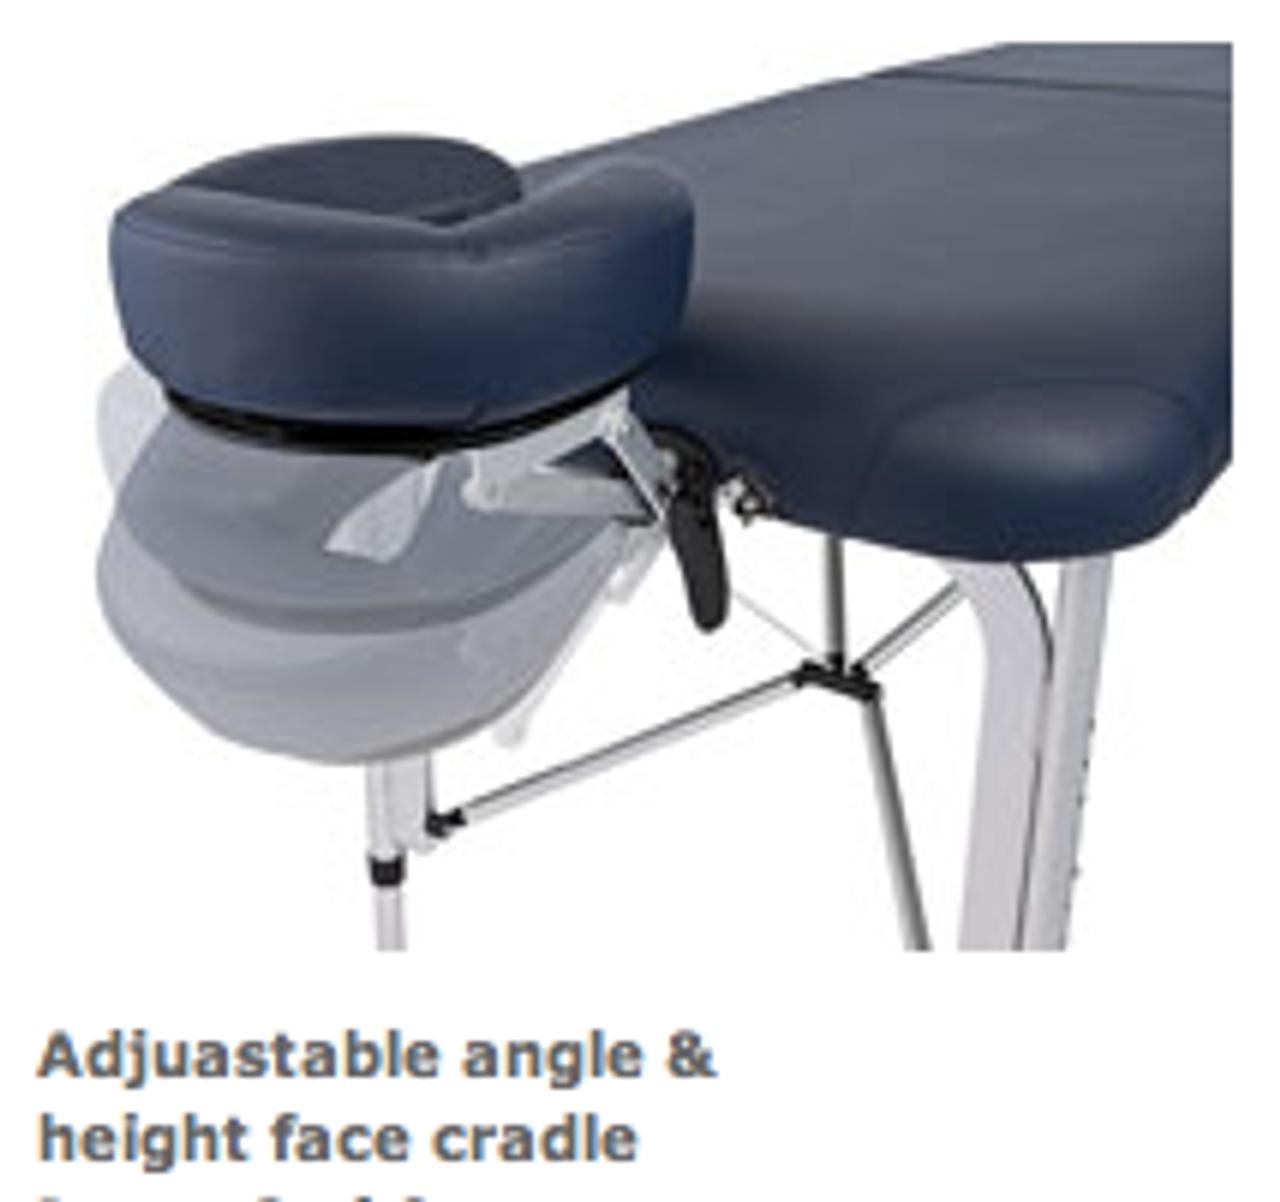 Optional headrest